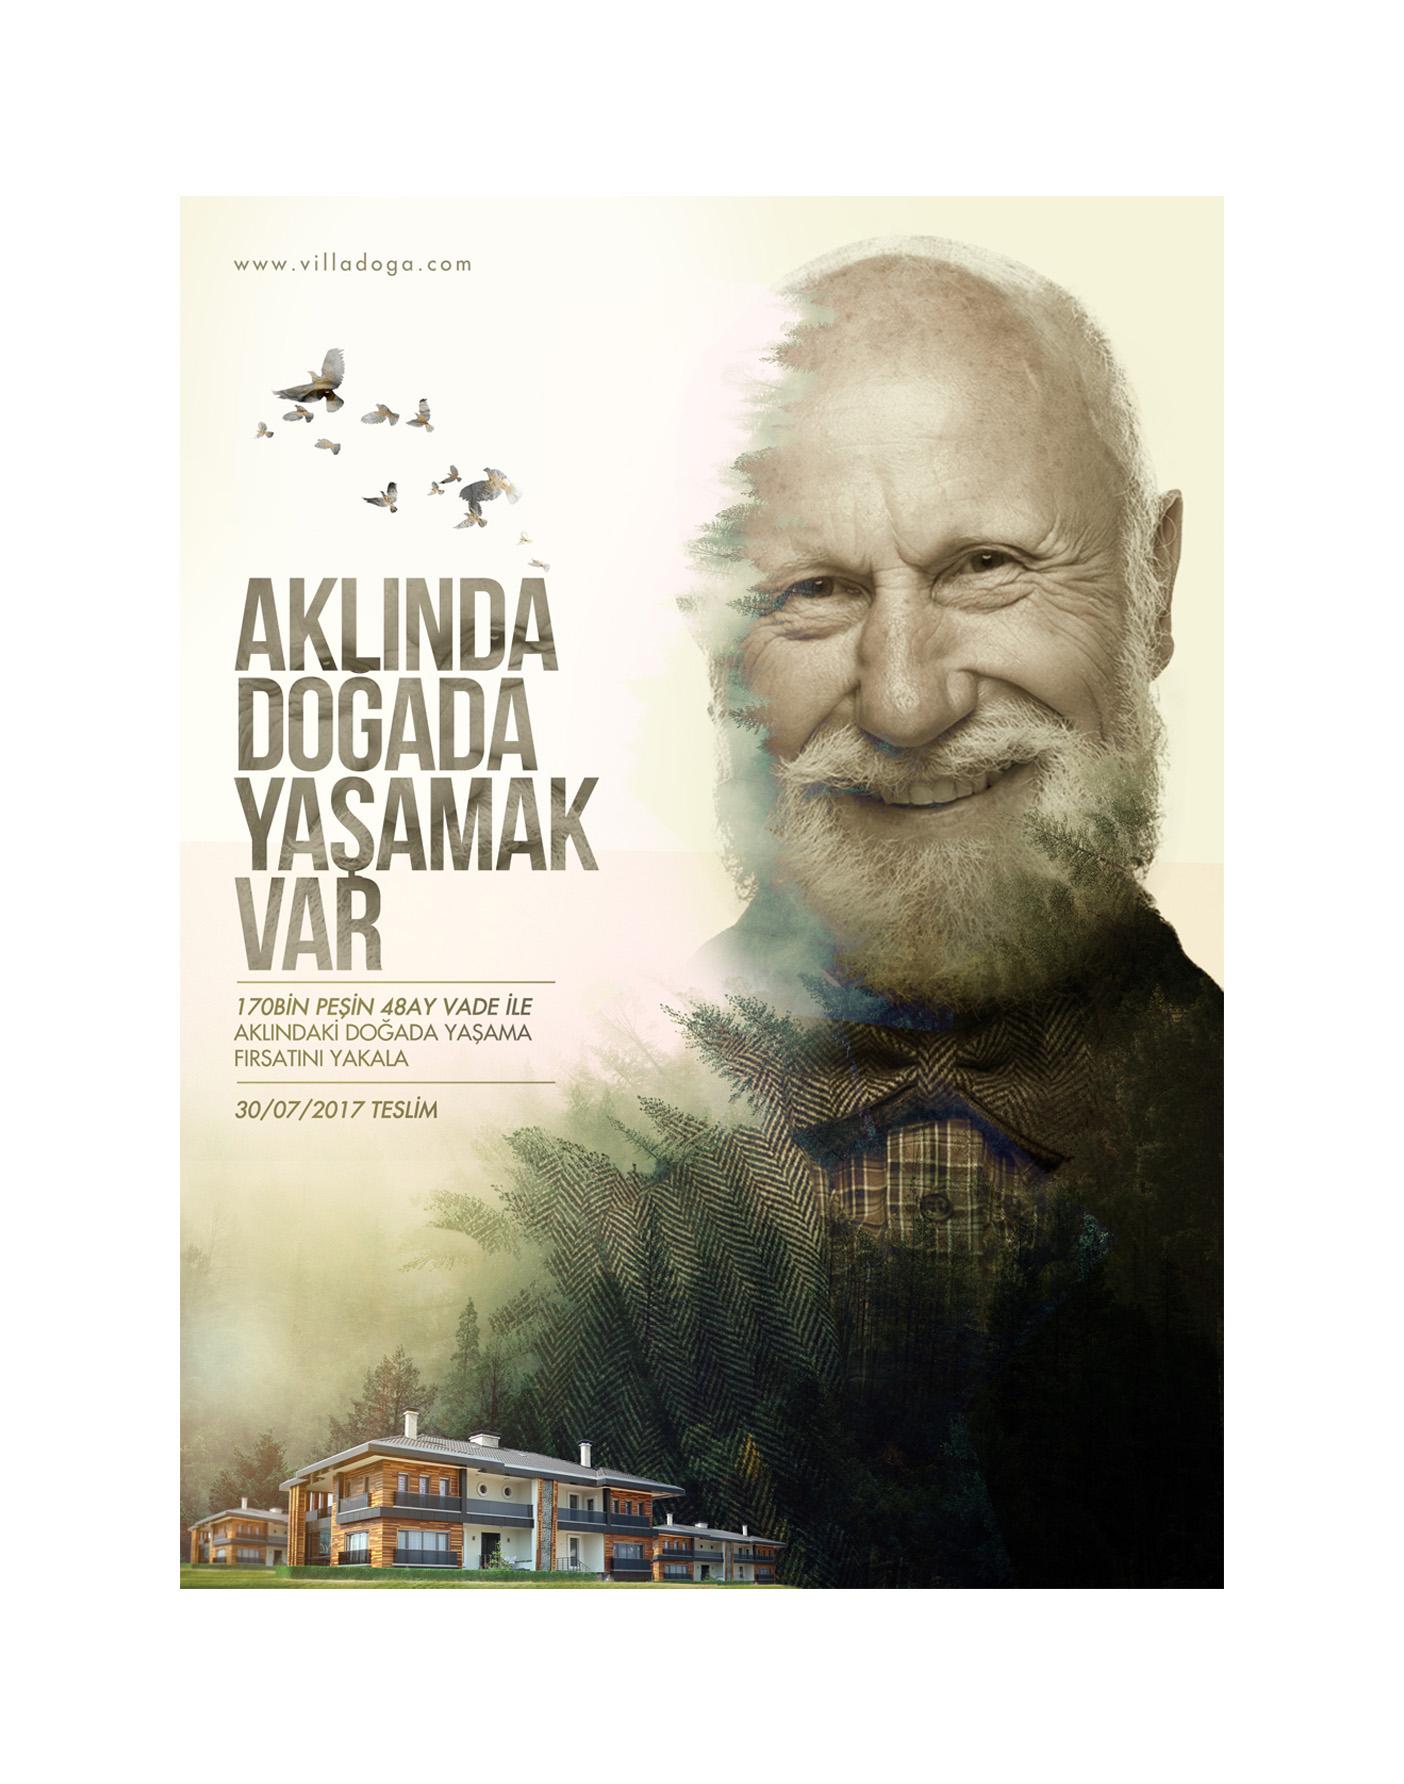 villa doga adv 1 - Villa Doğa